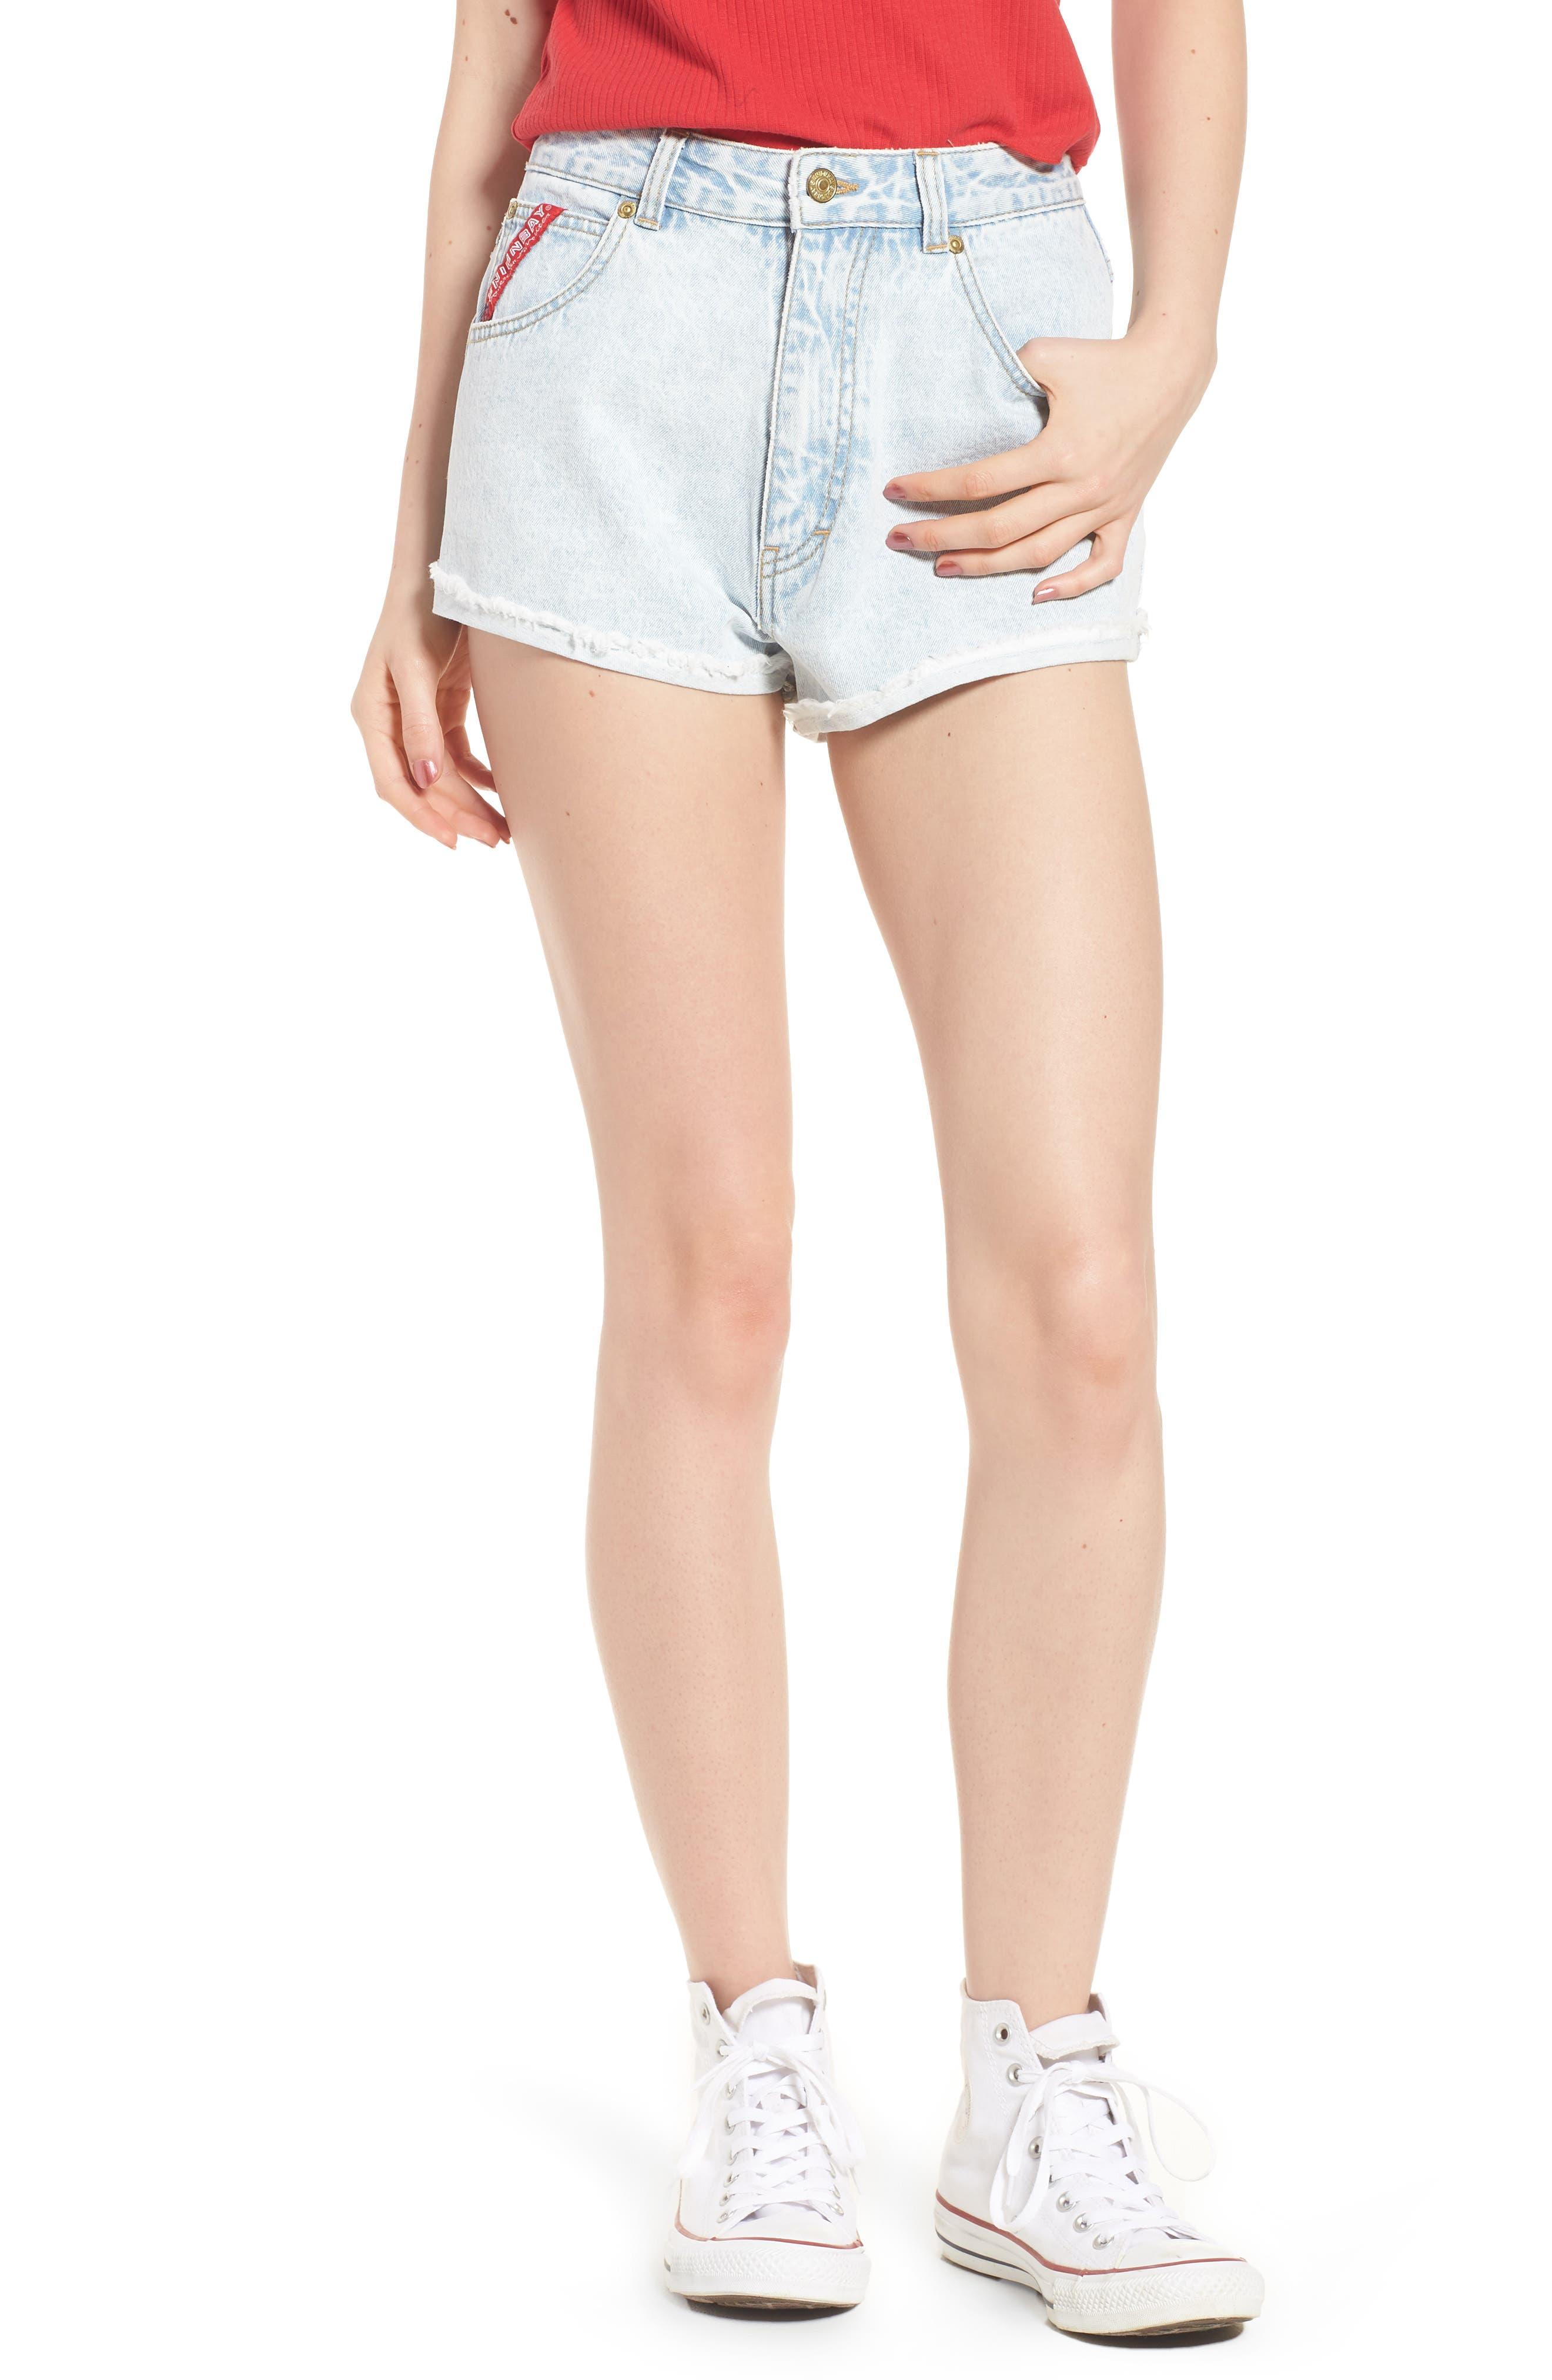 Unionbay Devo Acid Wash Denim Shorts,                             Main thumbnail 1, color,                             401